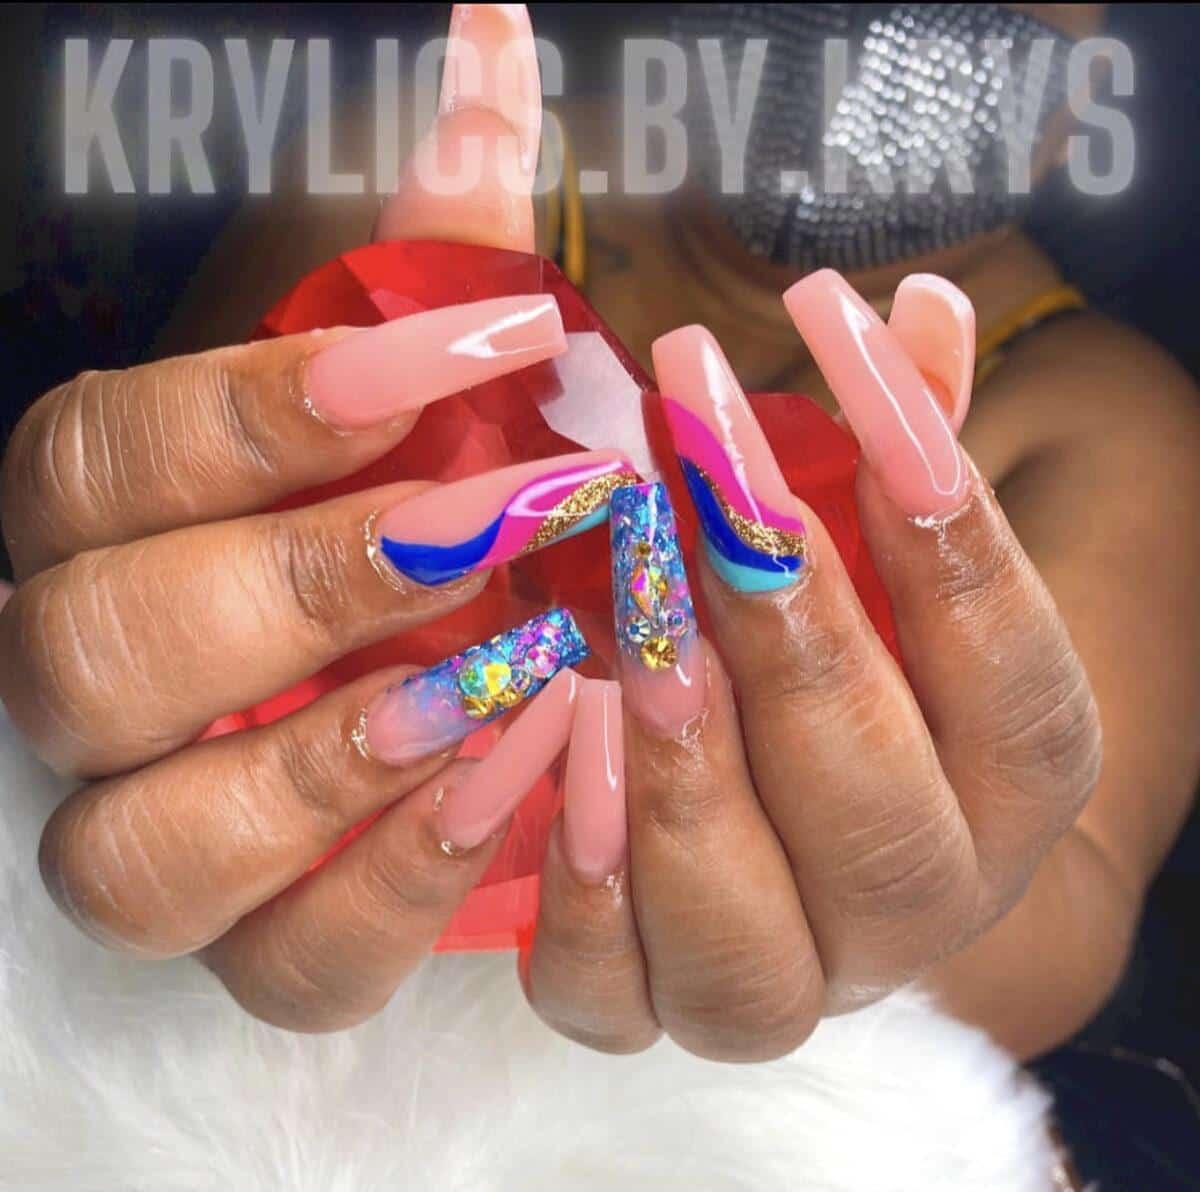 Krylics By Krys LLC